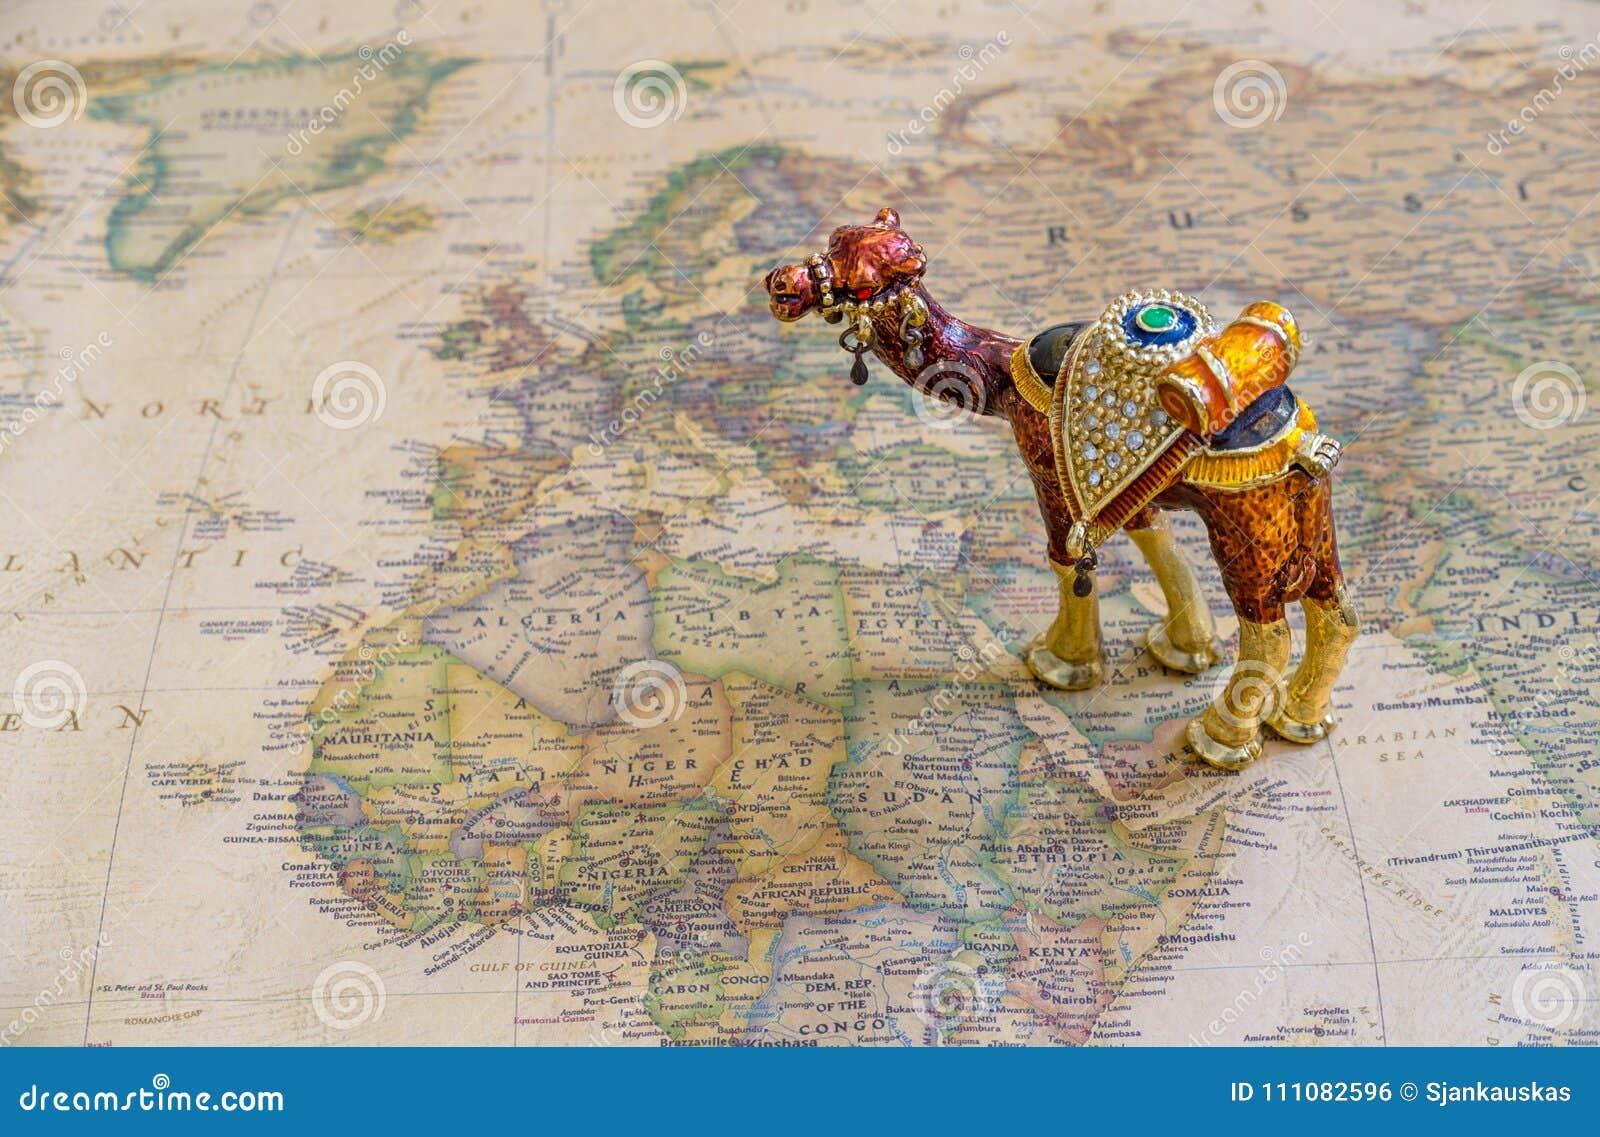 Turismo, cultura, riqueza do conceito do mundo árabe, mapa de países árabes